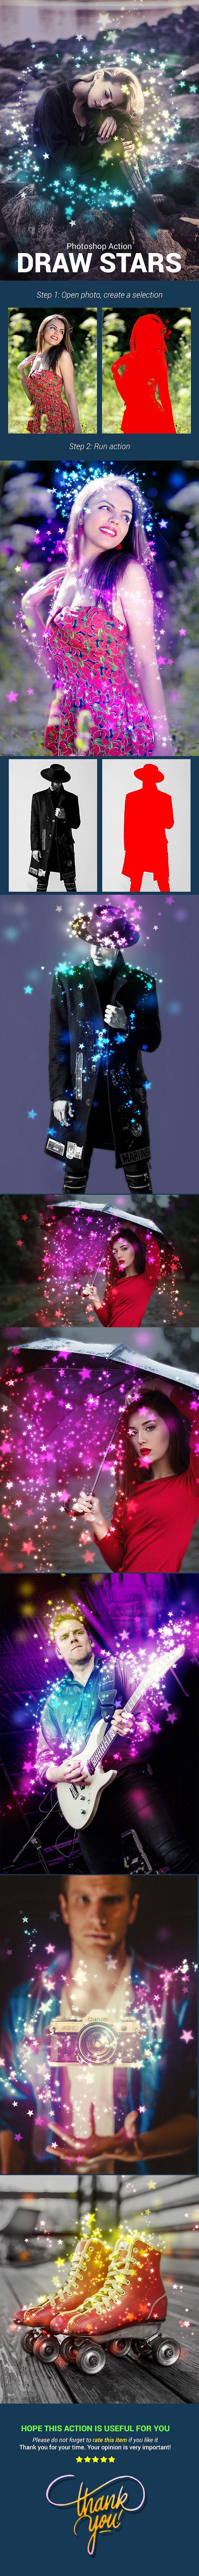 Draw Stars — Photoshop ATN #blur #art • Download ➝ https://graphicriver.net/item/draw-stars/21456030?ref=pxcr